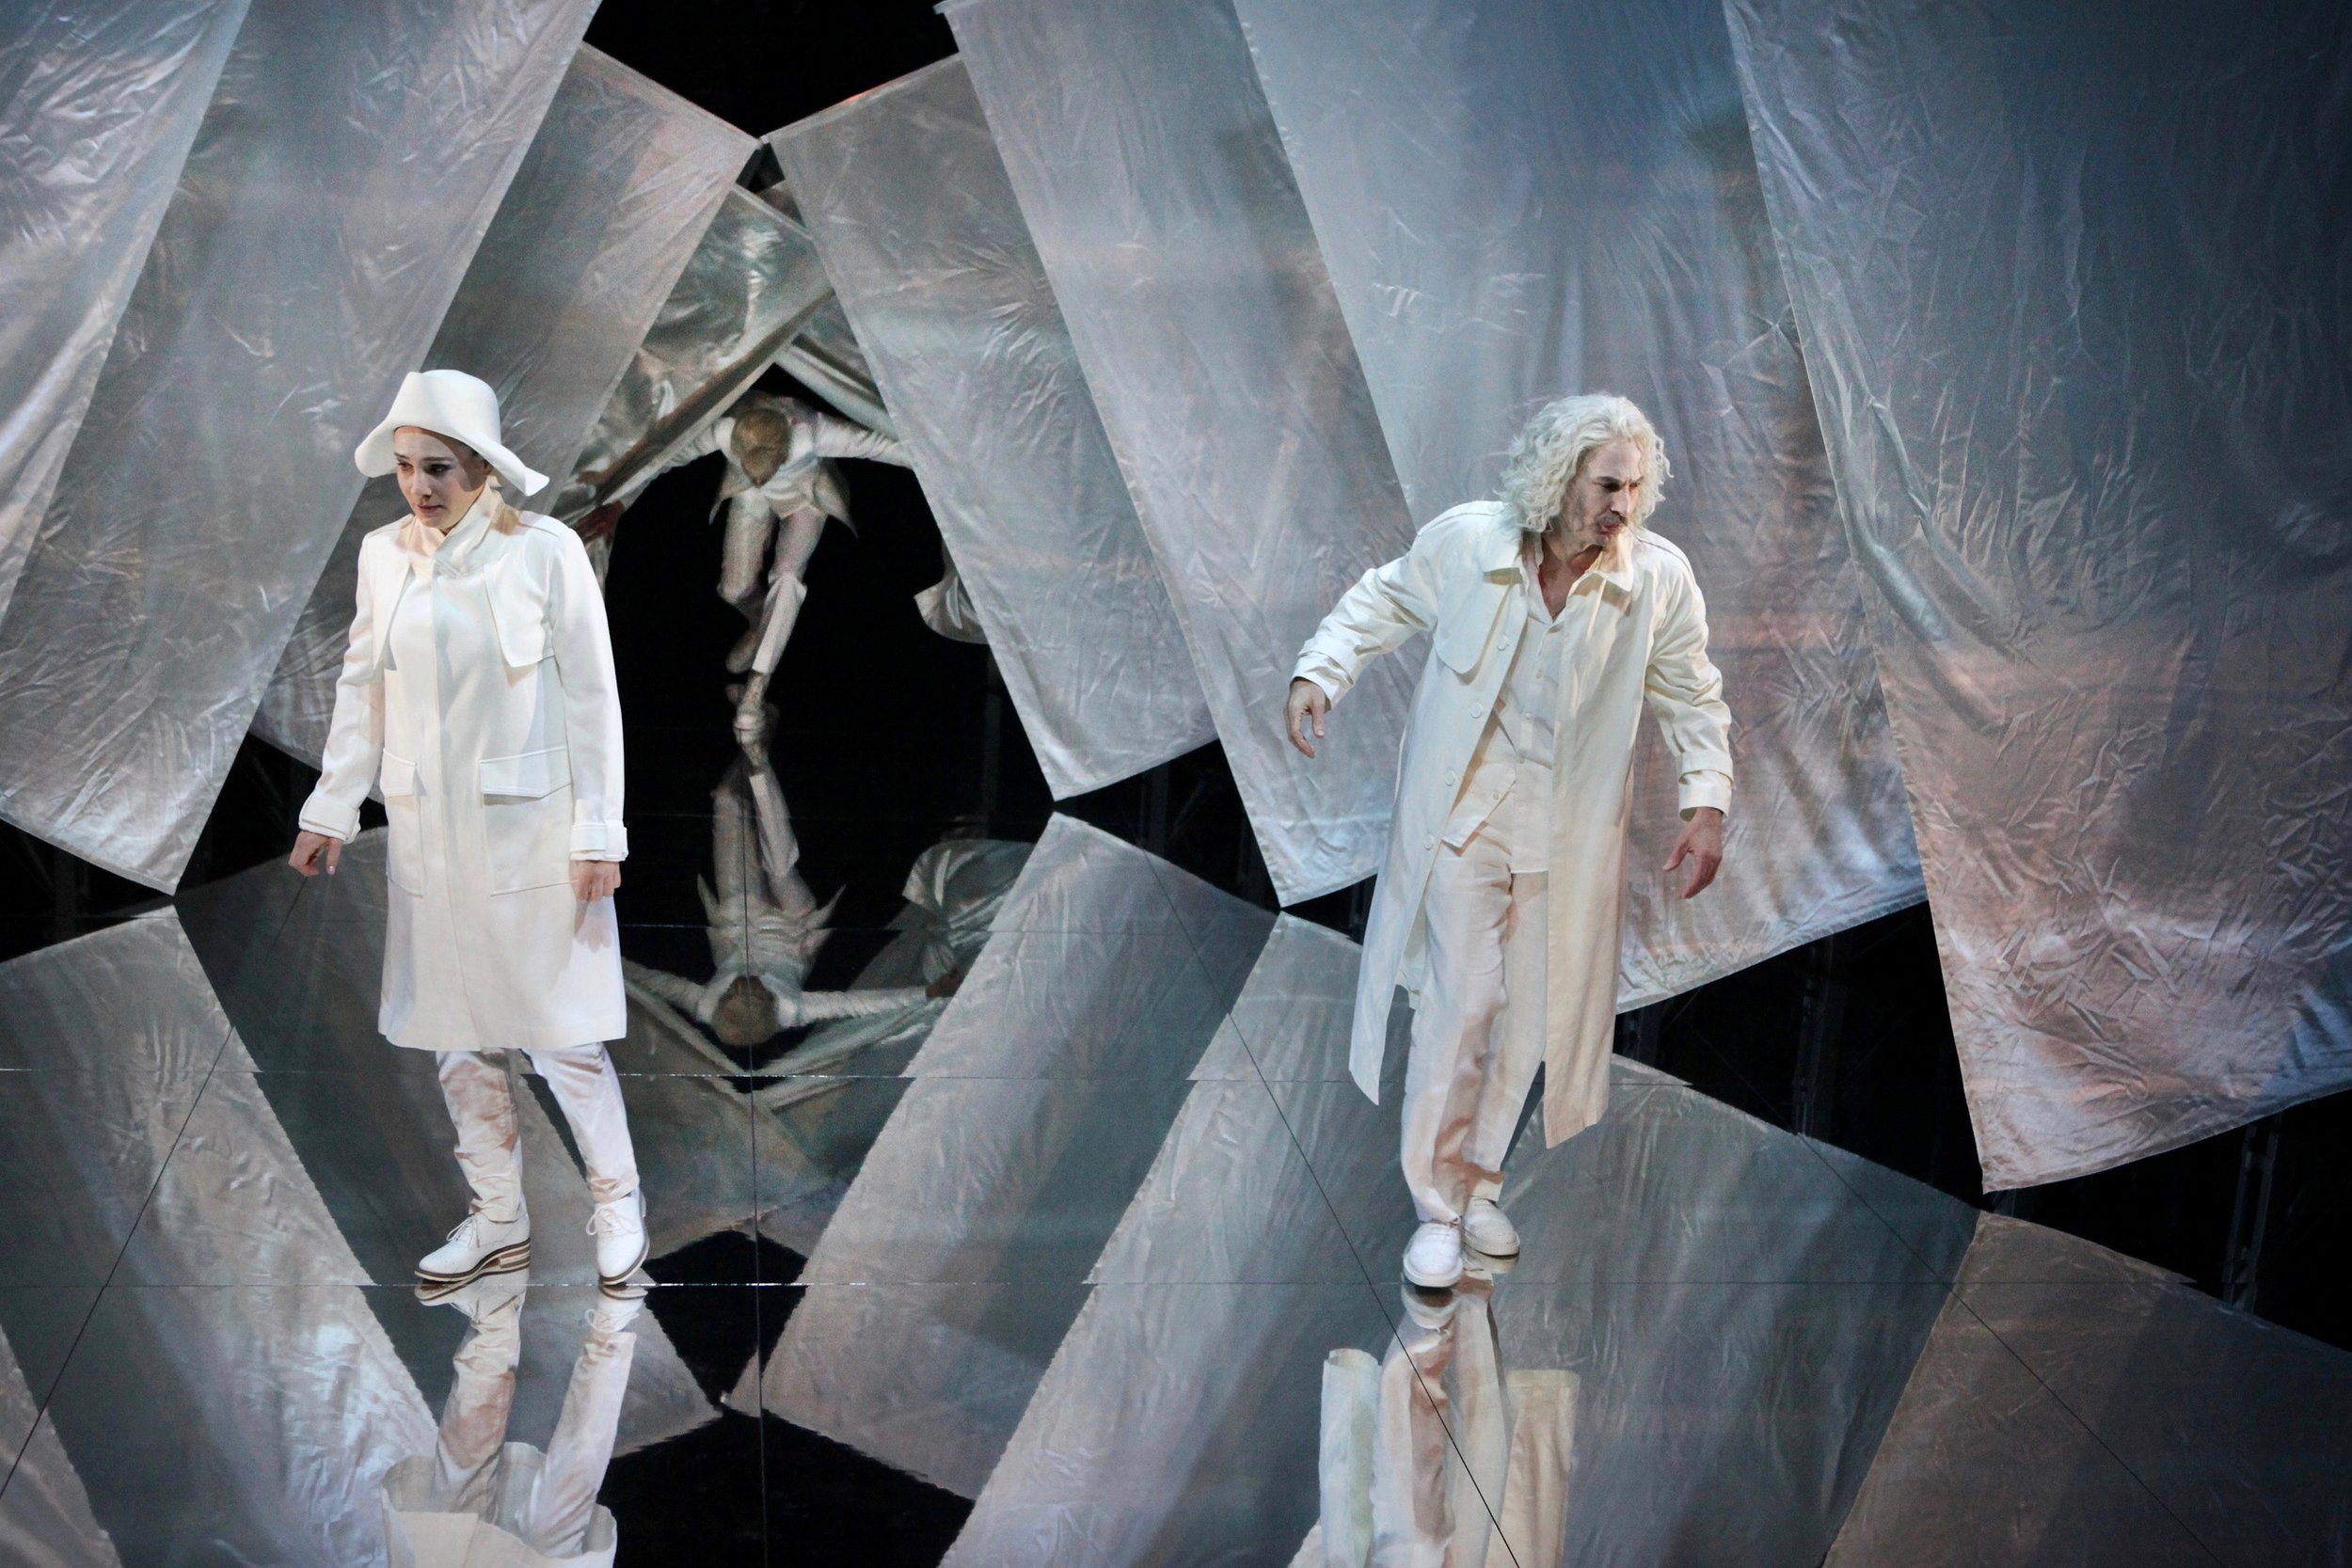 Othello 03 © Sanne Peper.jpeg